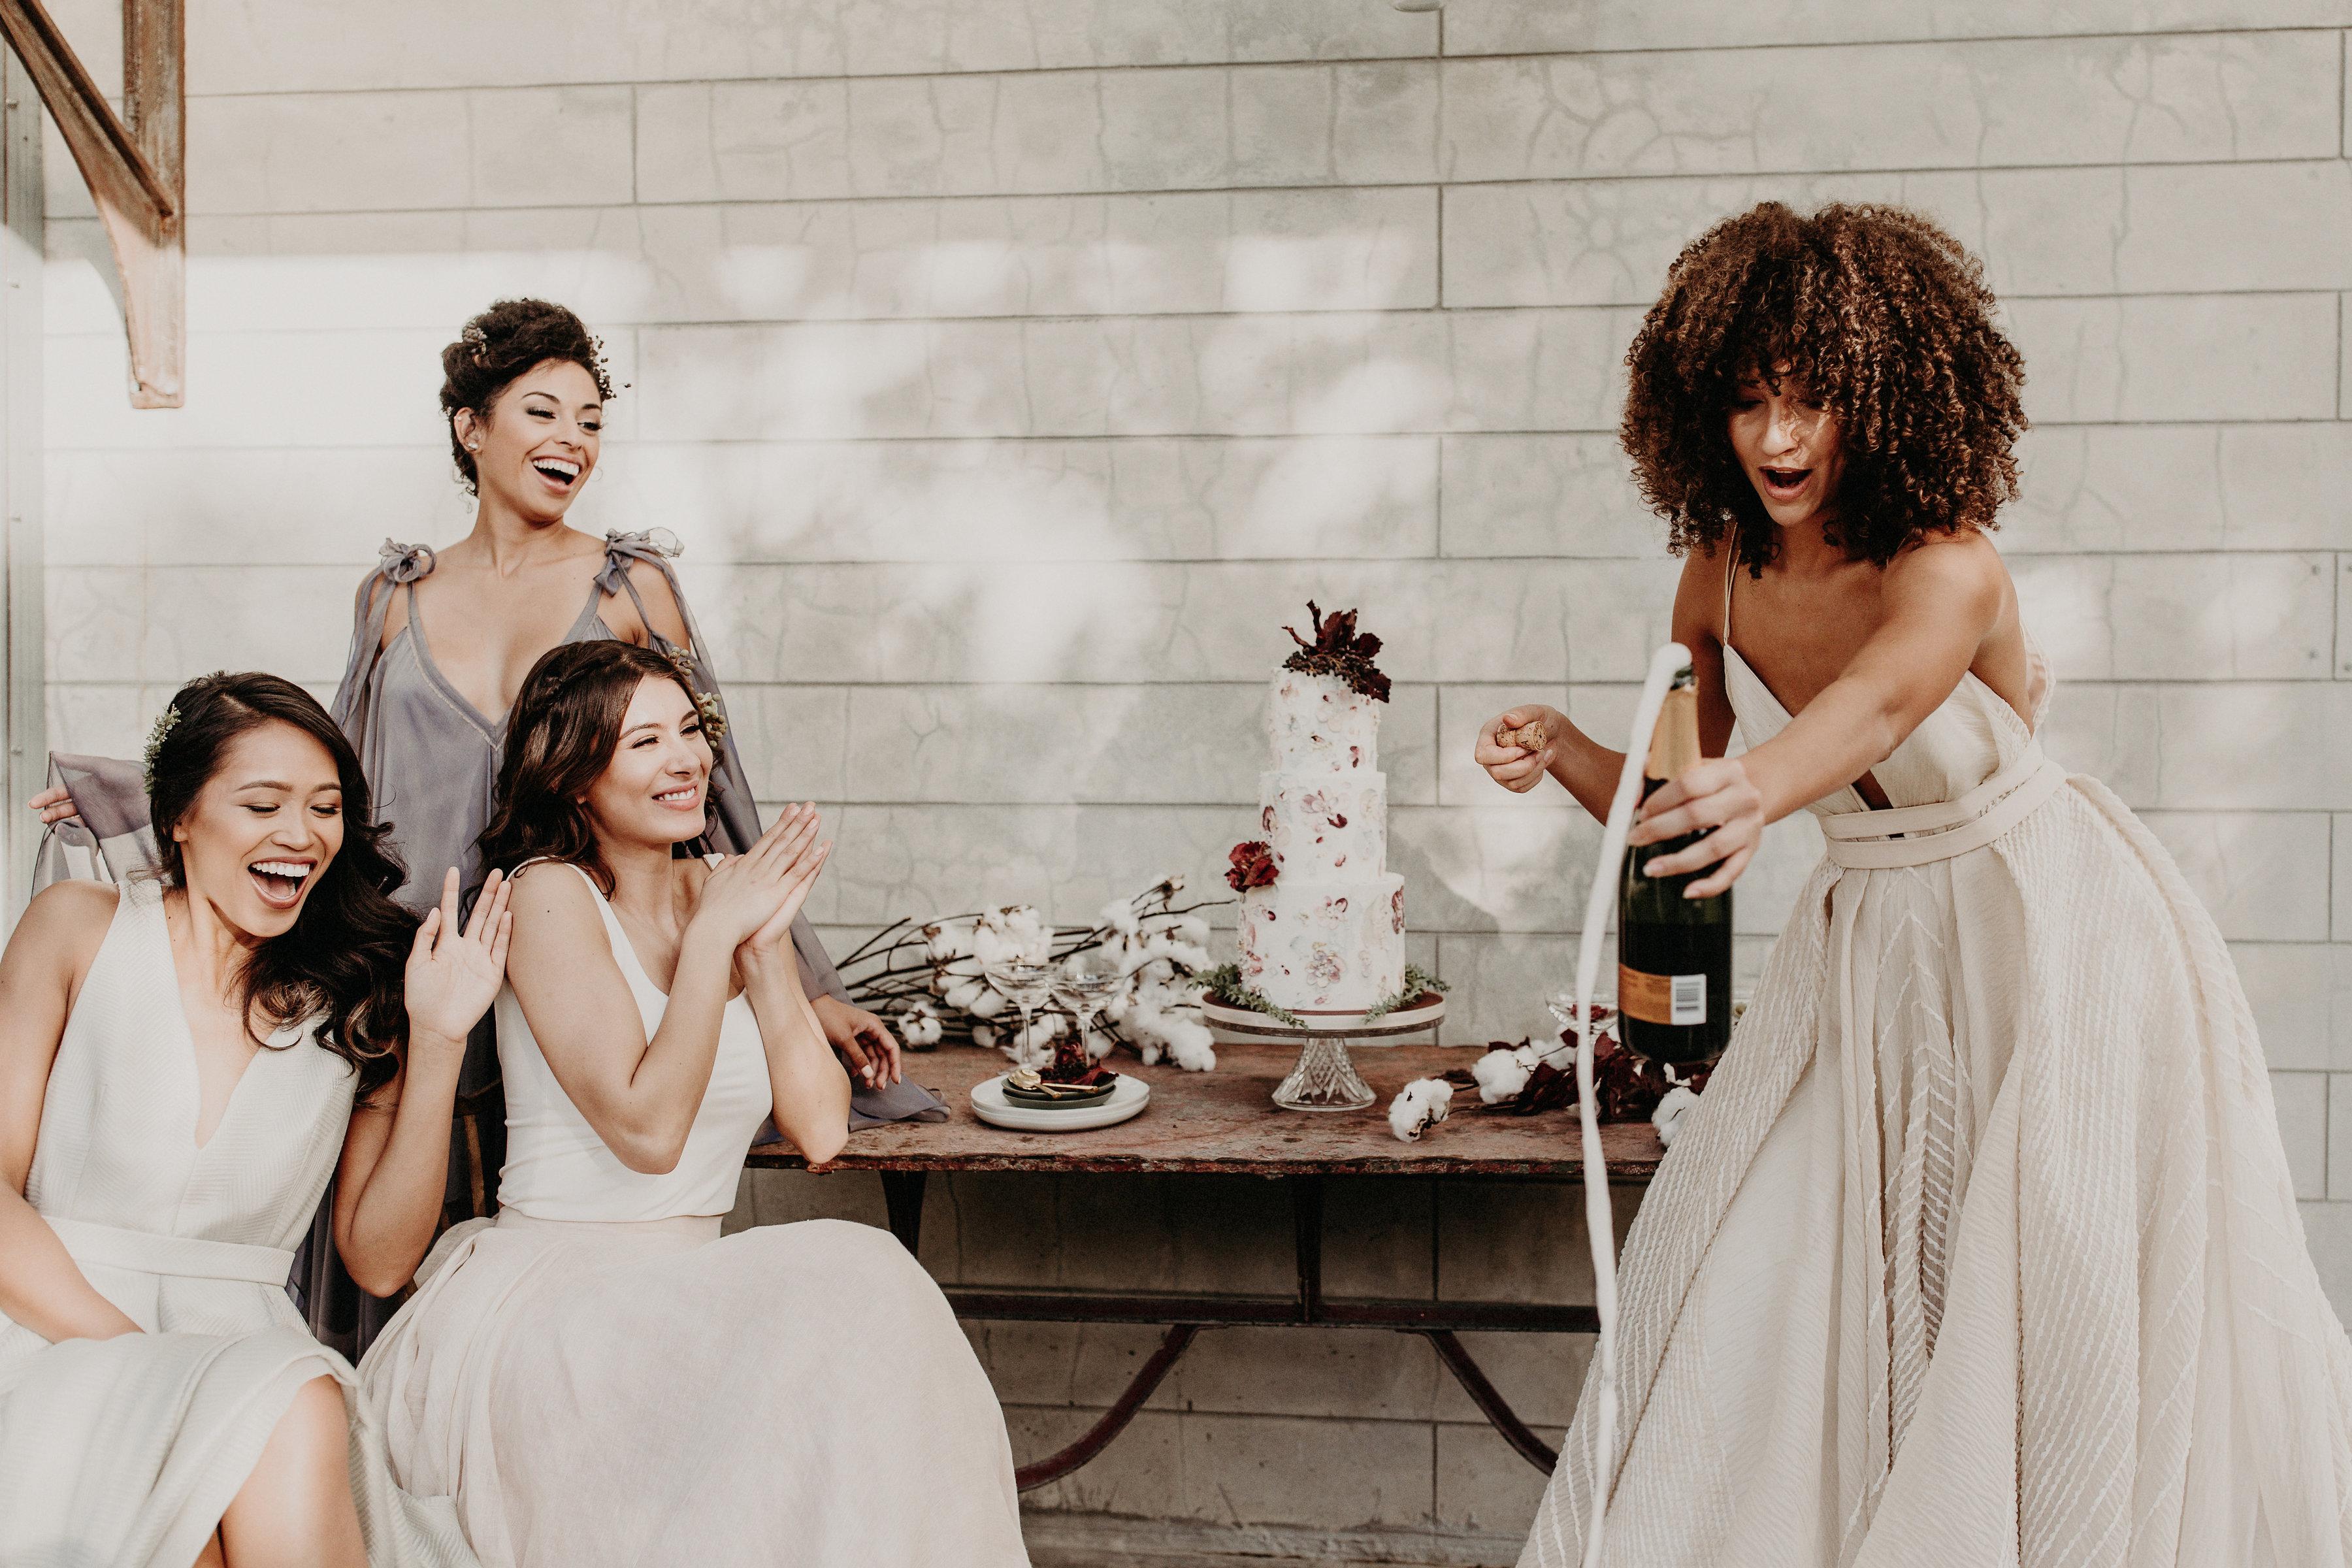 Winter Blossoms The Bridal Editorial Film The Creatives Loft Weddings